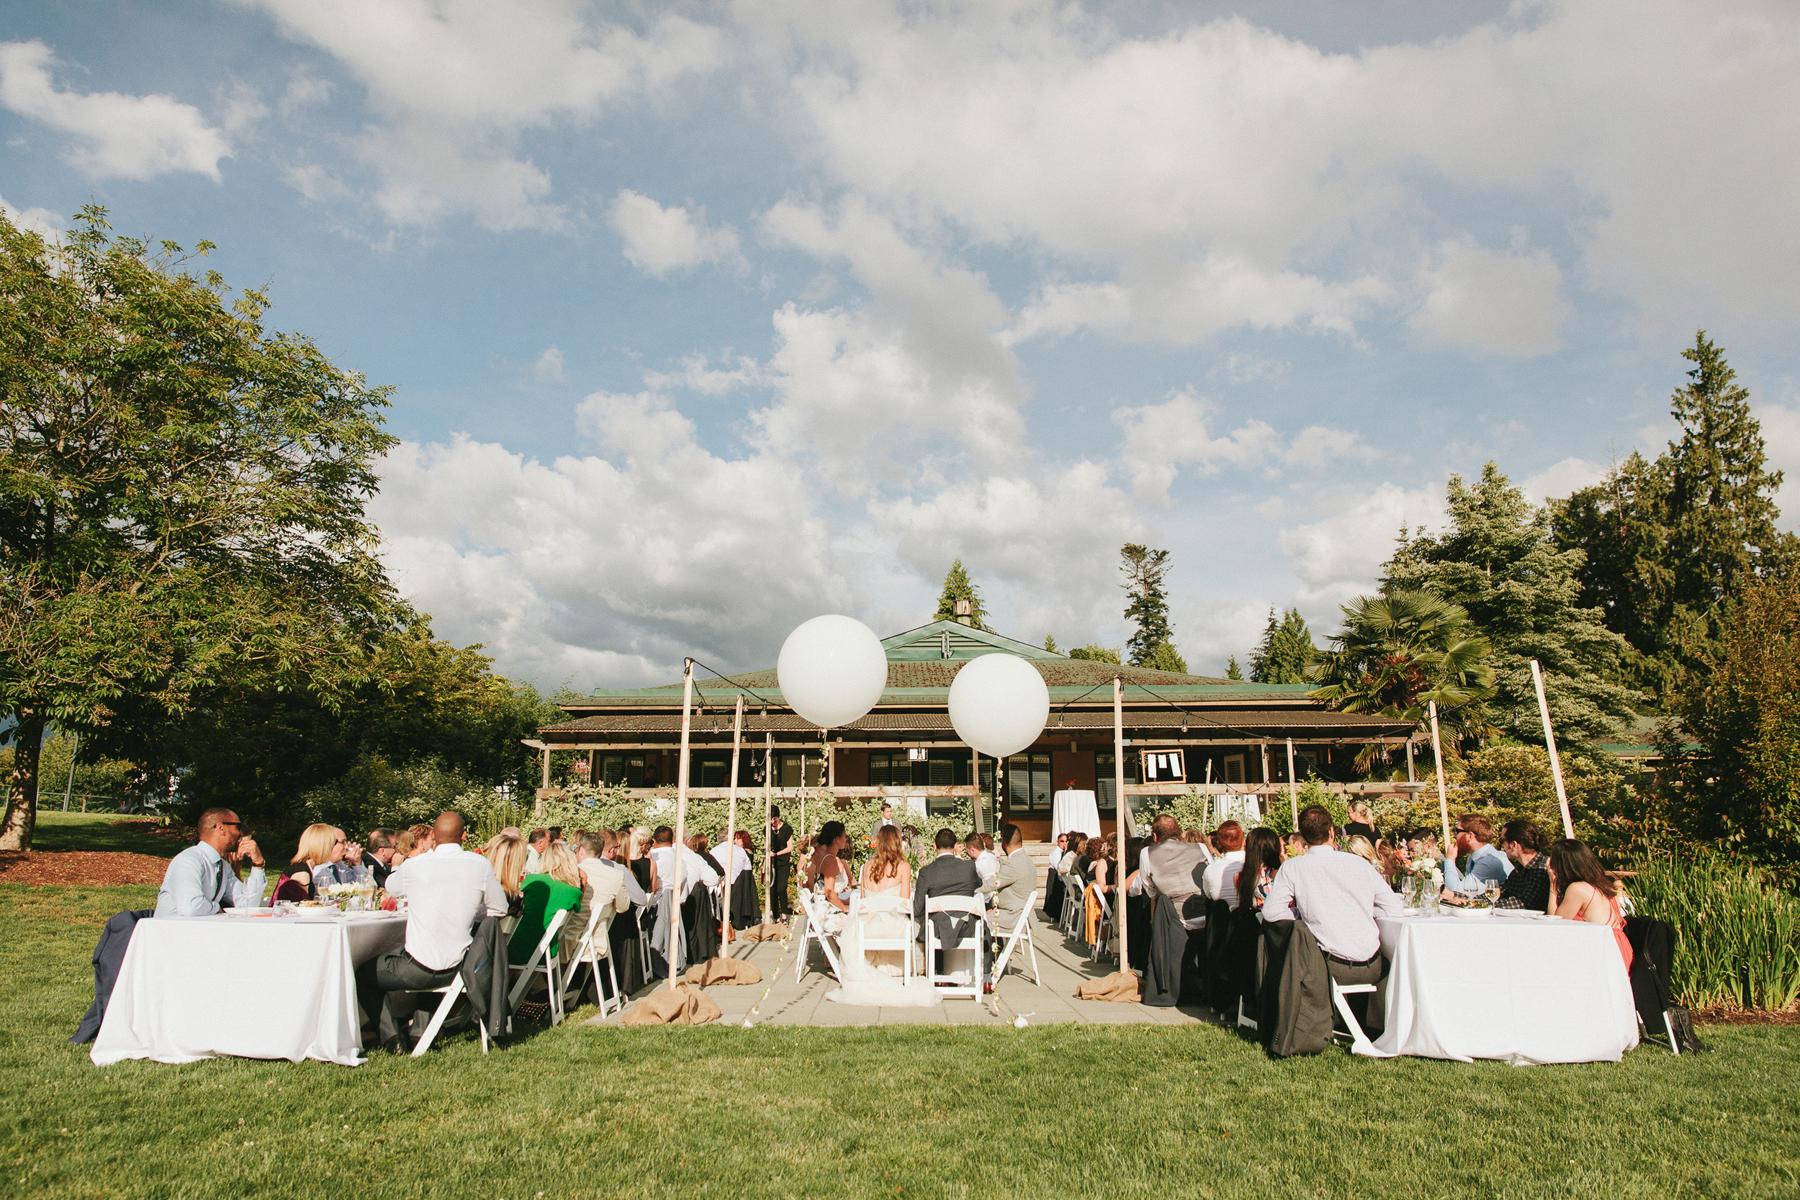 UBC-Botanical-Garden-Wedding-AD-082.jpg